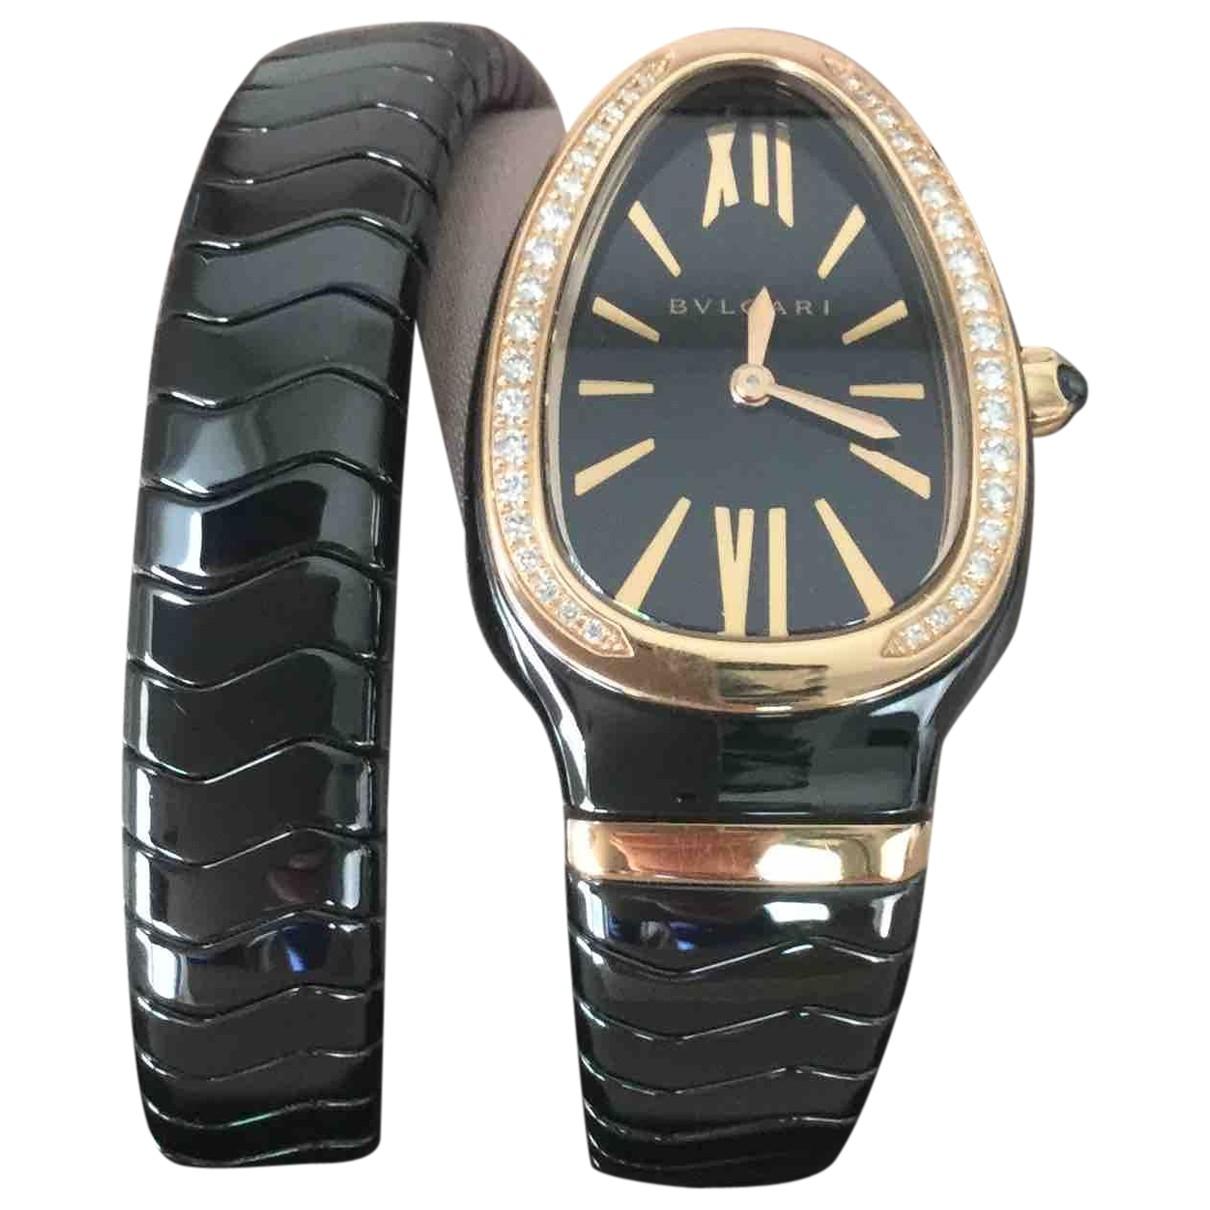 Reloj Serpenti Bvlgari